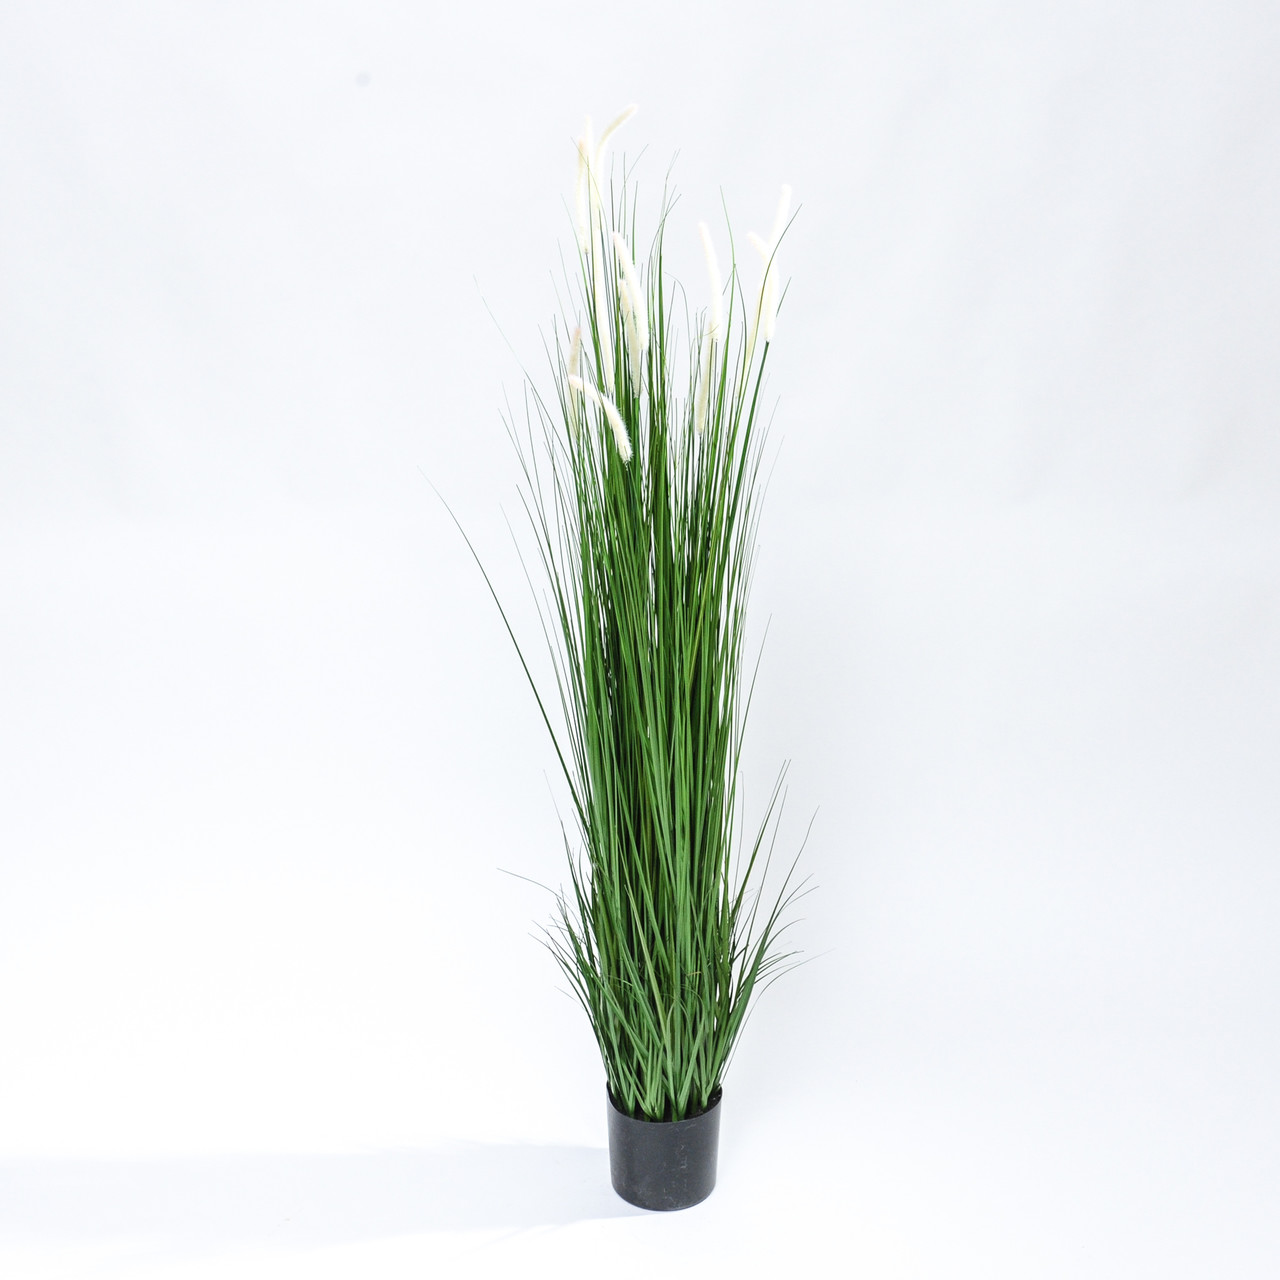 Kunst Pluimgras witte pluimen 180 cm